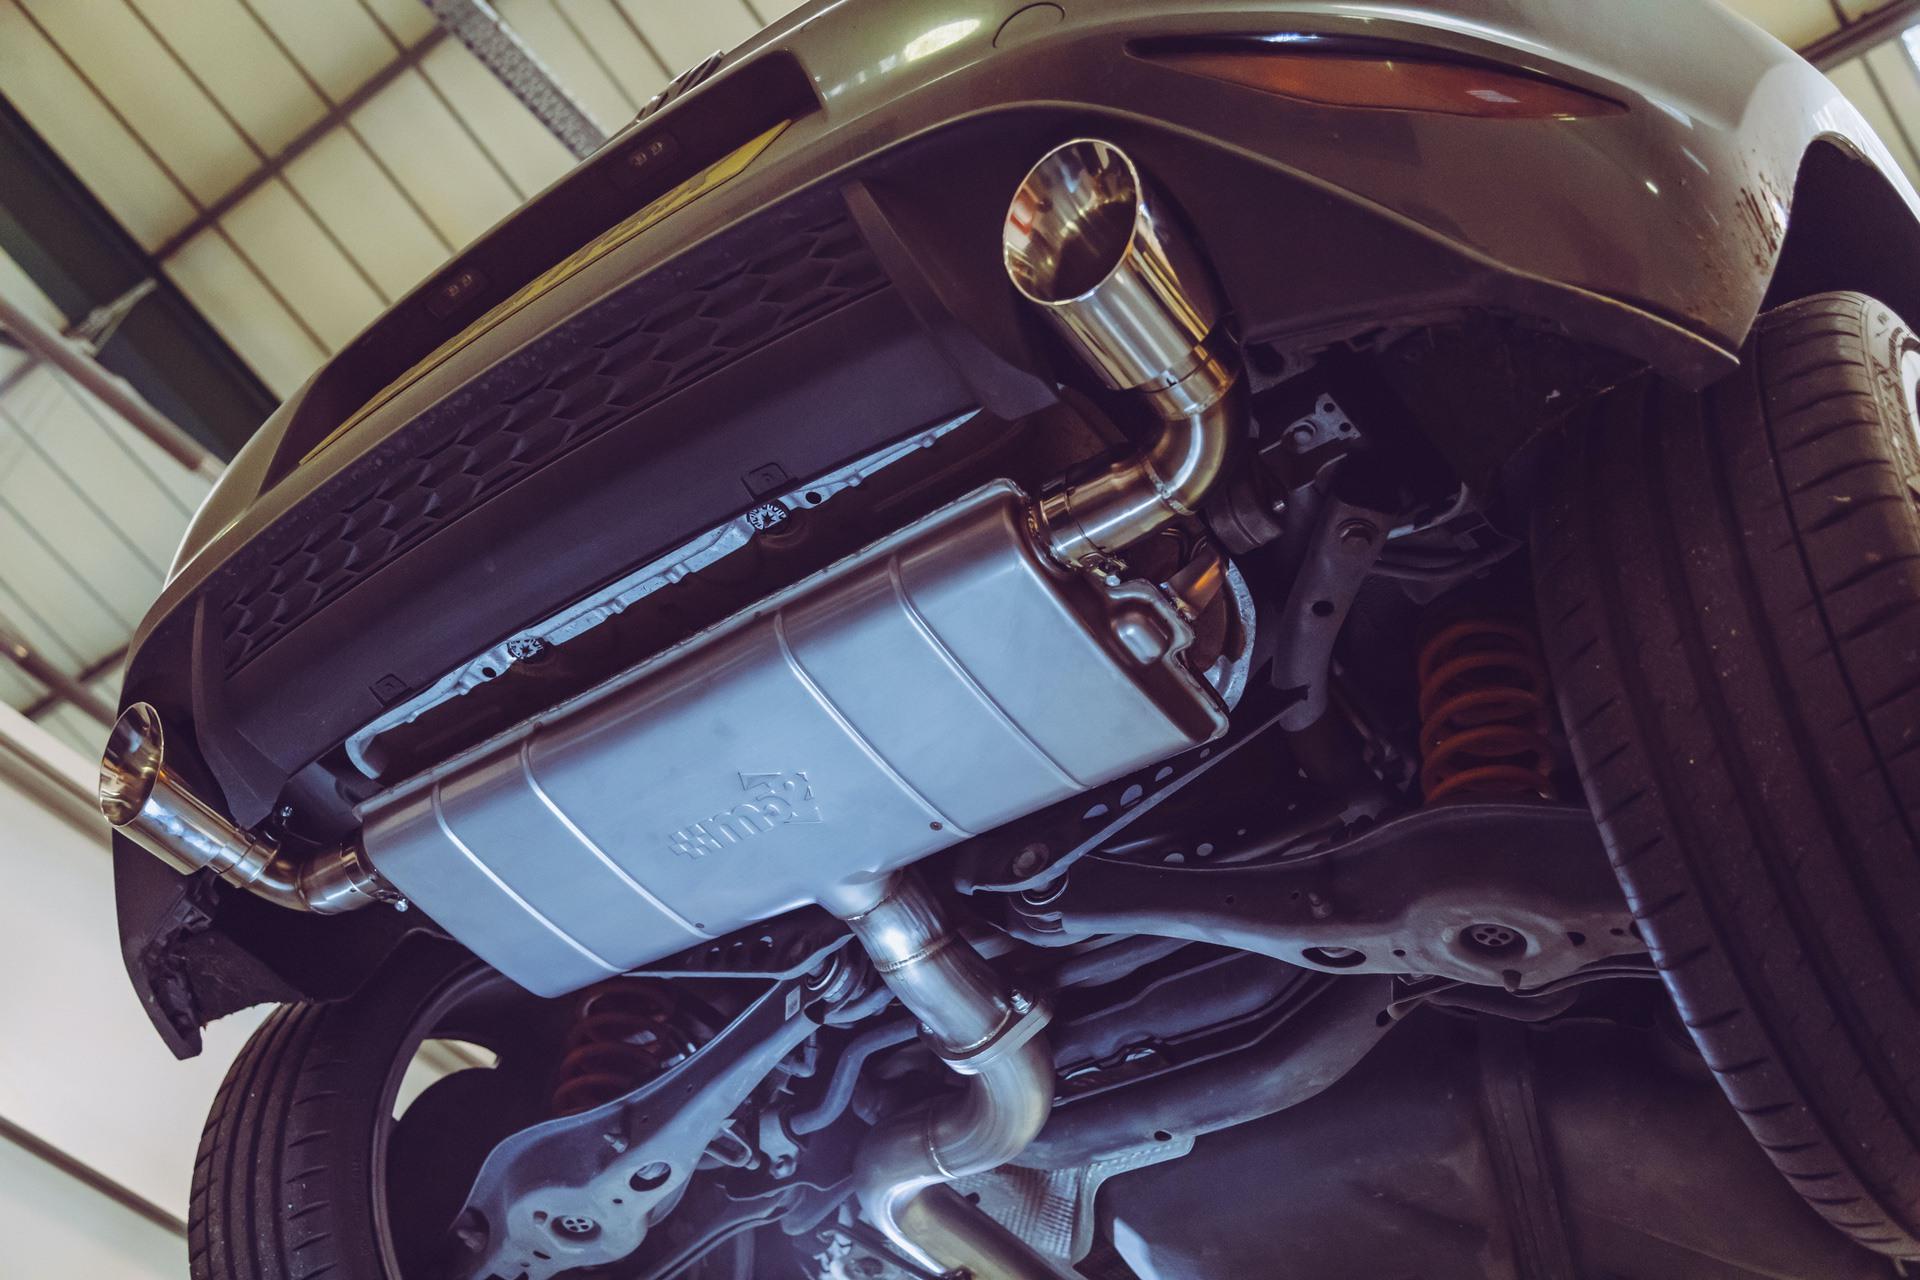 VW_Golf_GTI_Mk7_Mountune_exhaust_0010